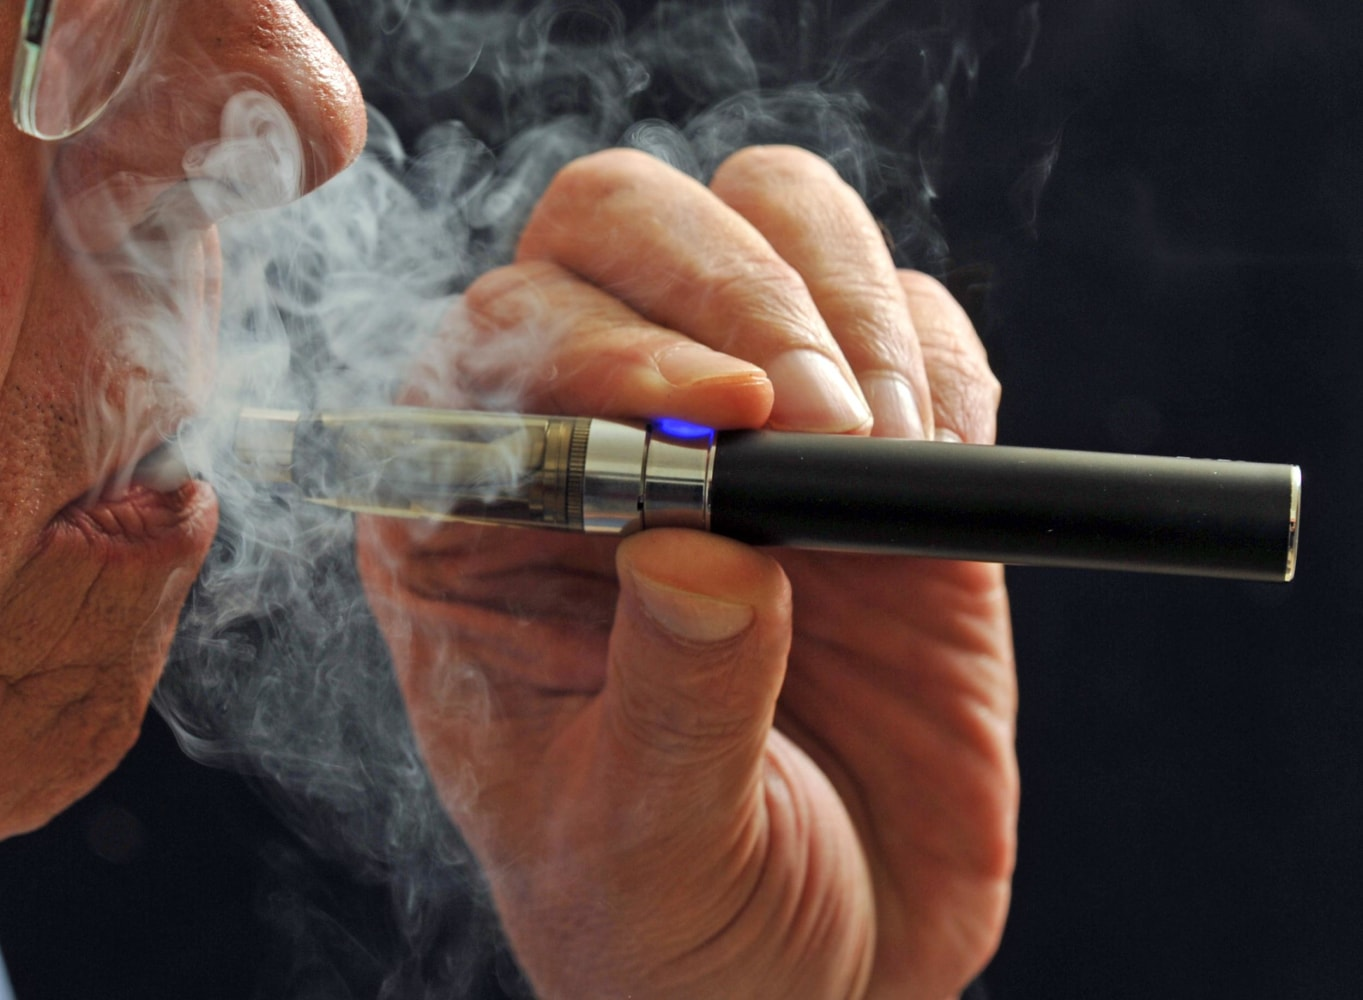 Finiti electric cigarette filter